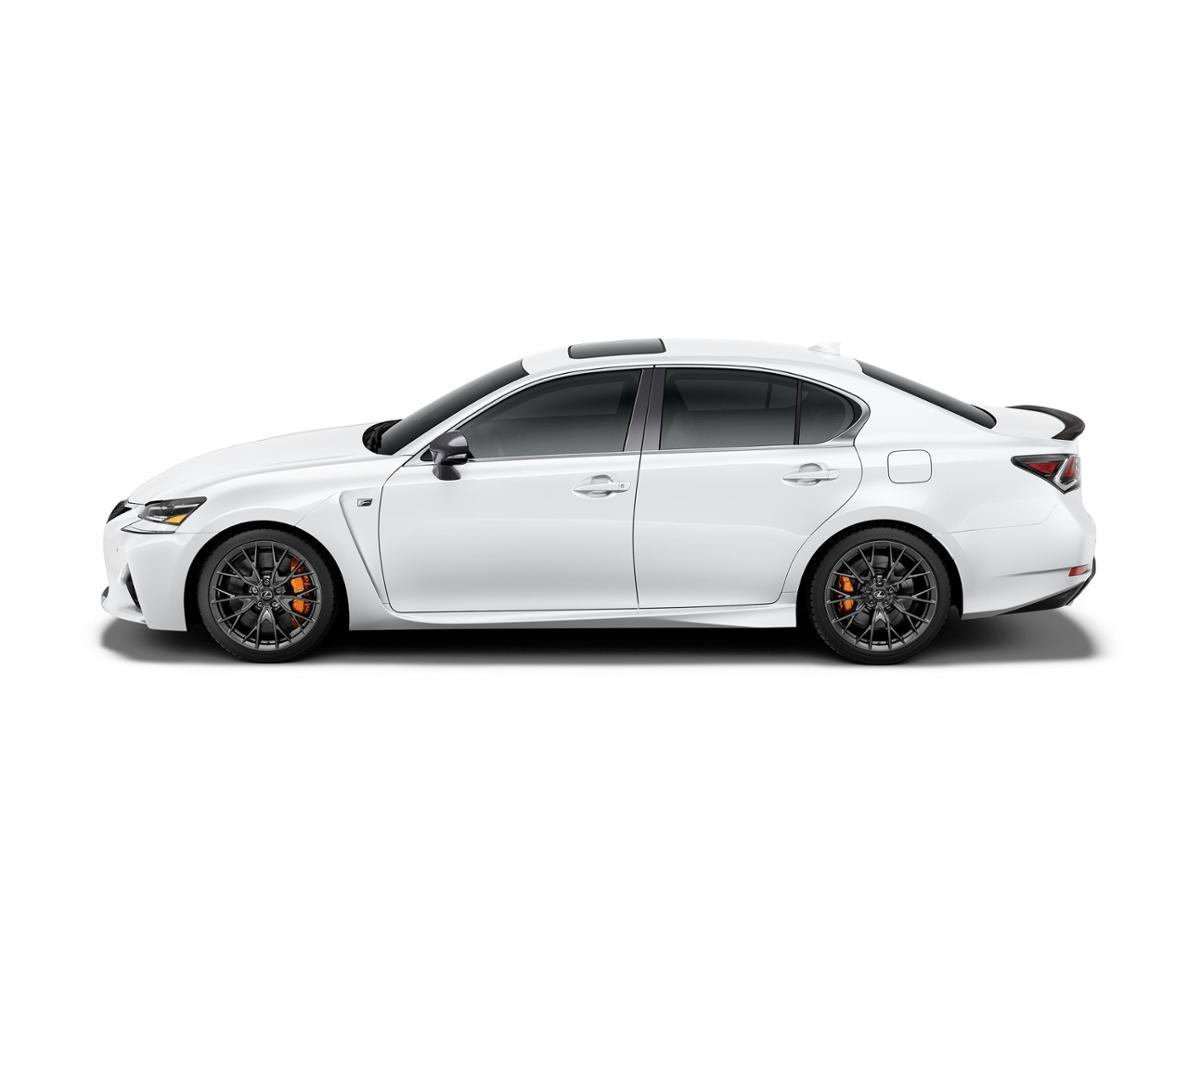 Lexus Gs Lease: New 2018 Lexus GS F For Sale In Rockville Centre, NY